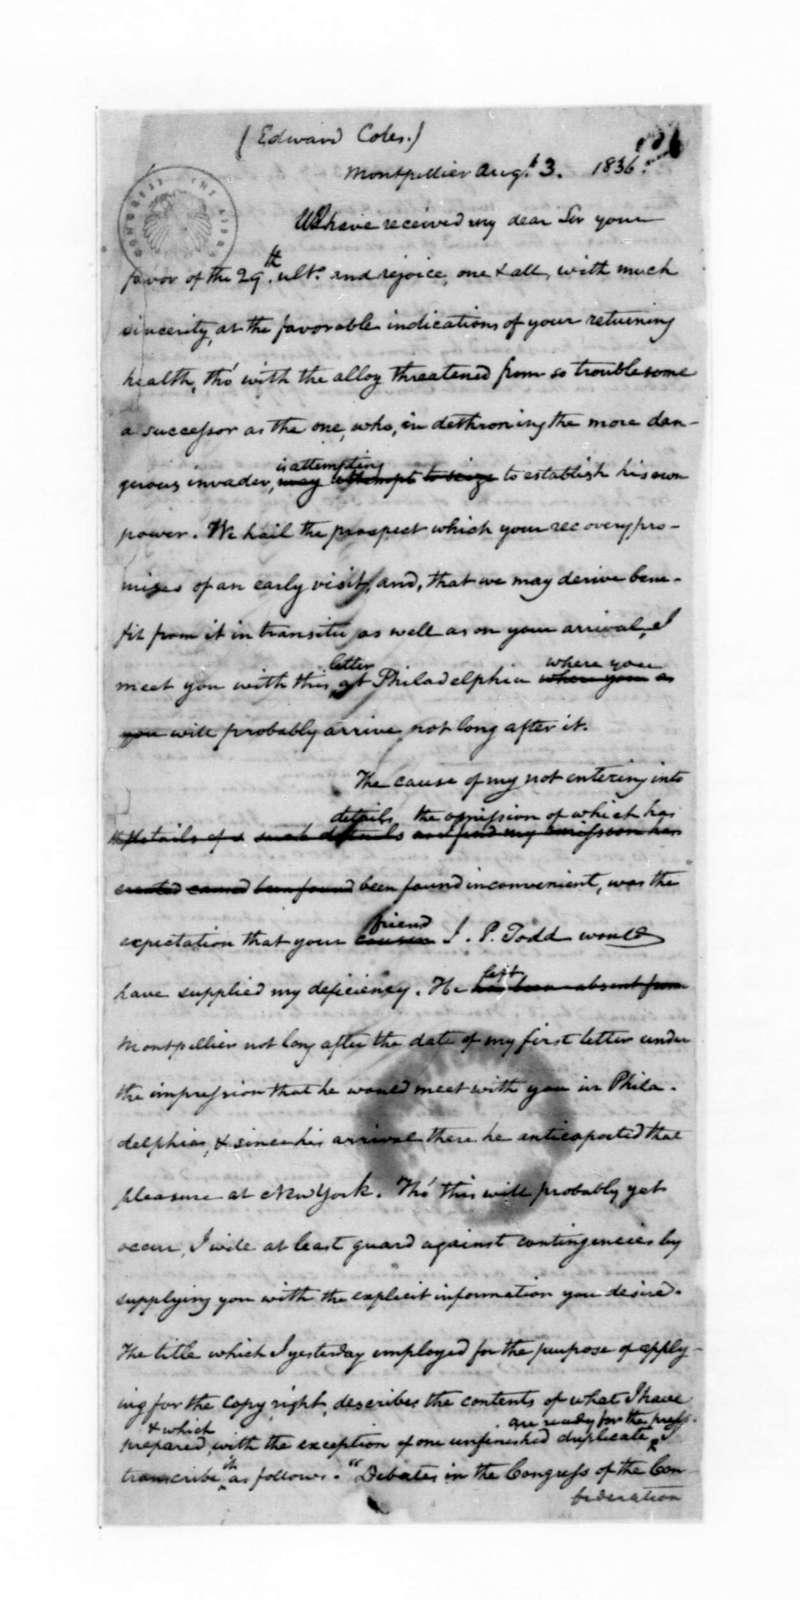 John C. Payne to Edward Coles, August 3, 1836.